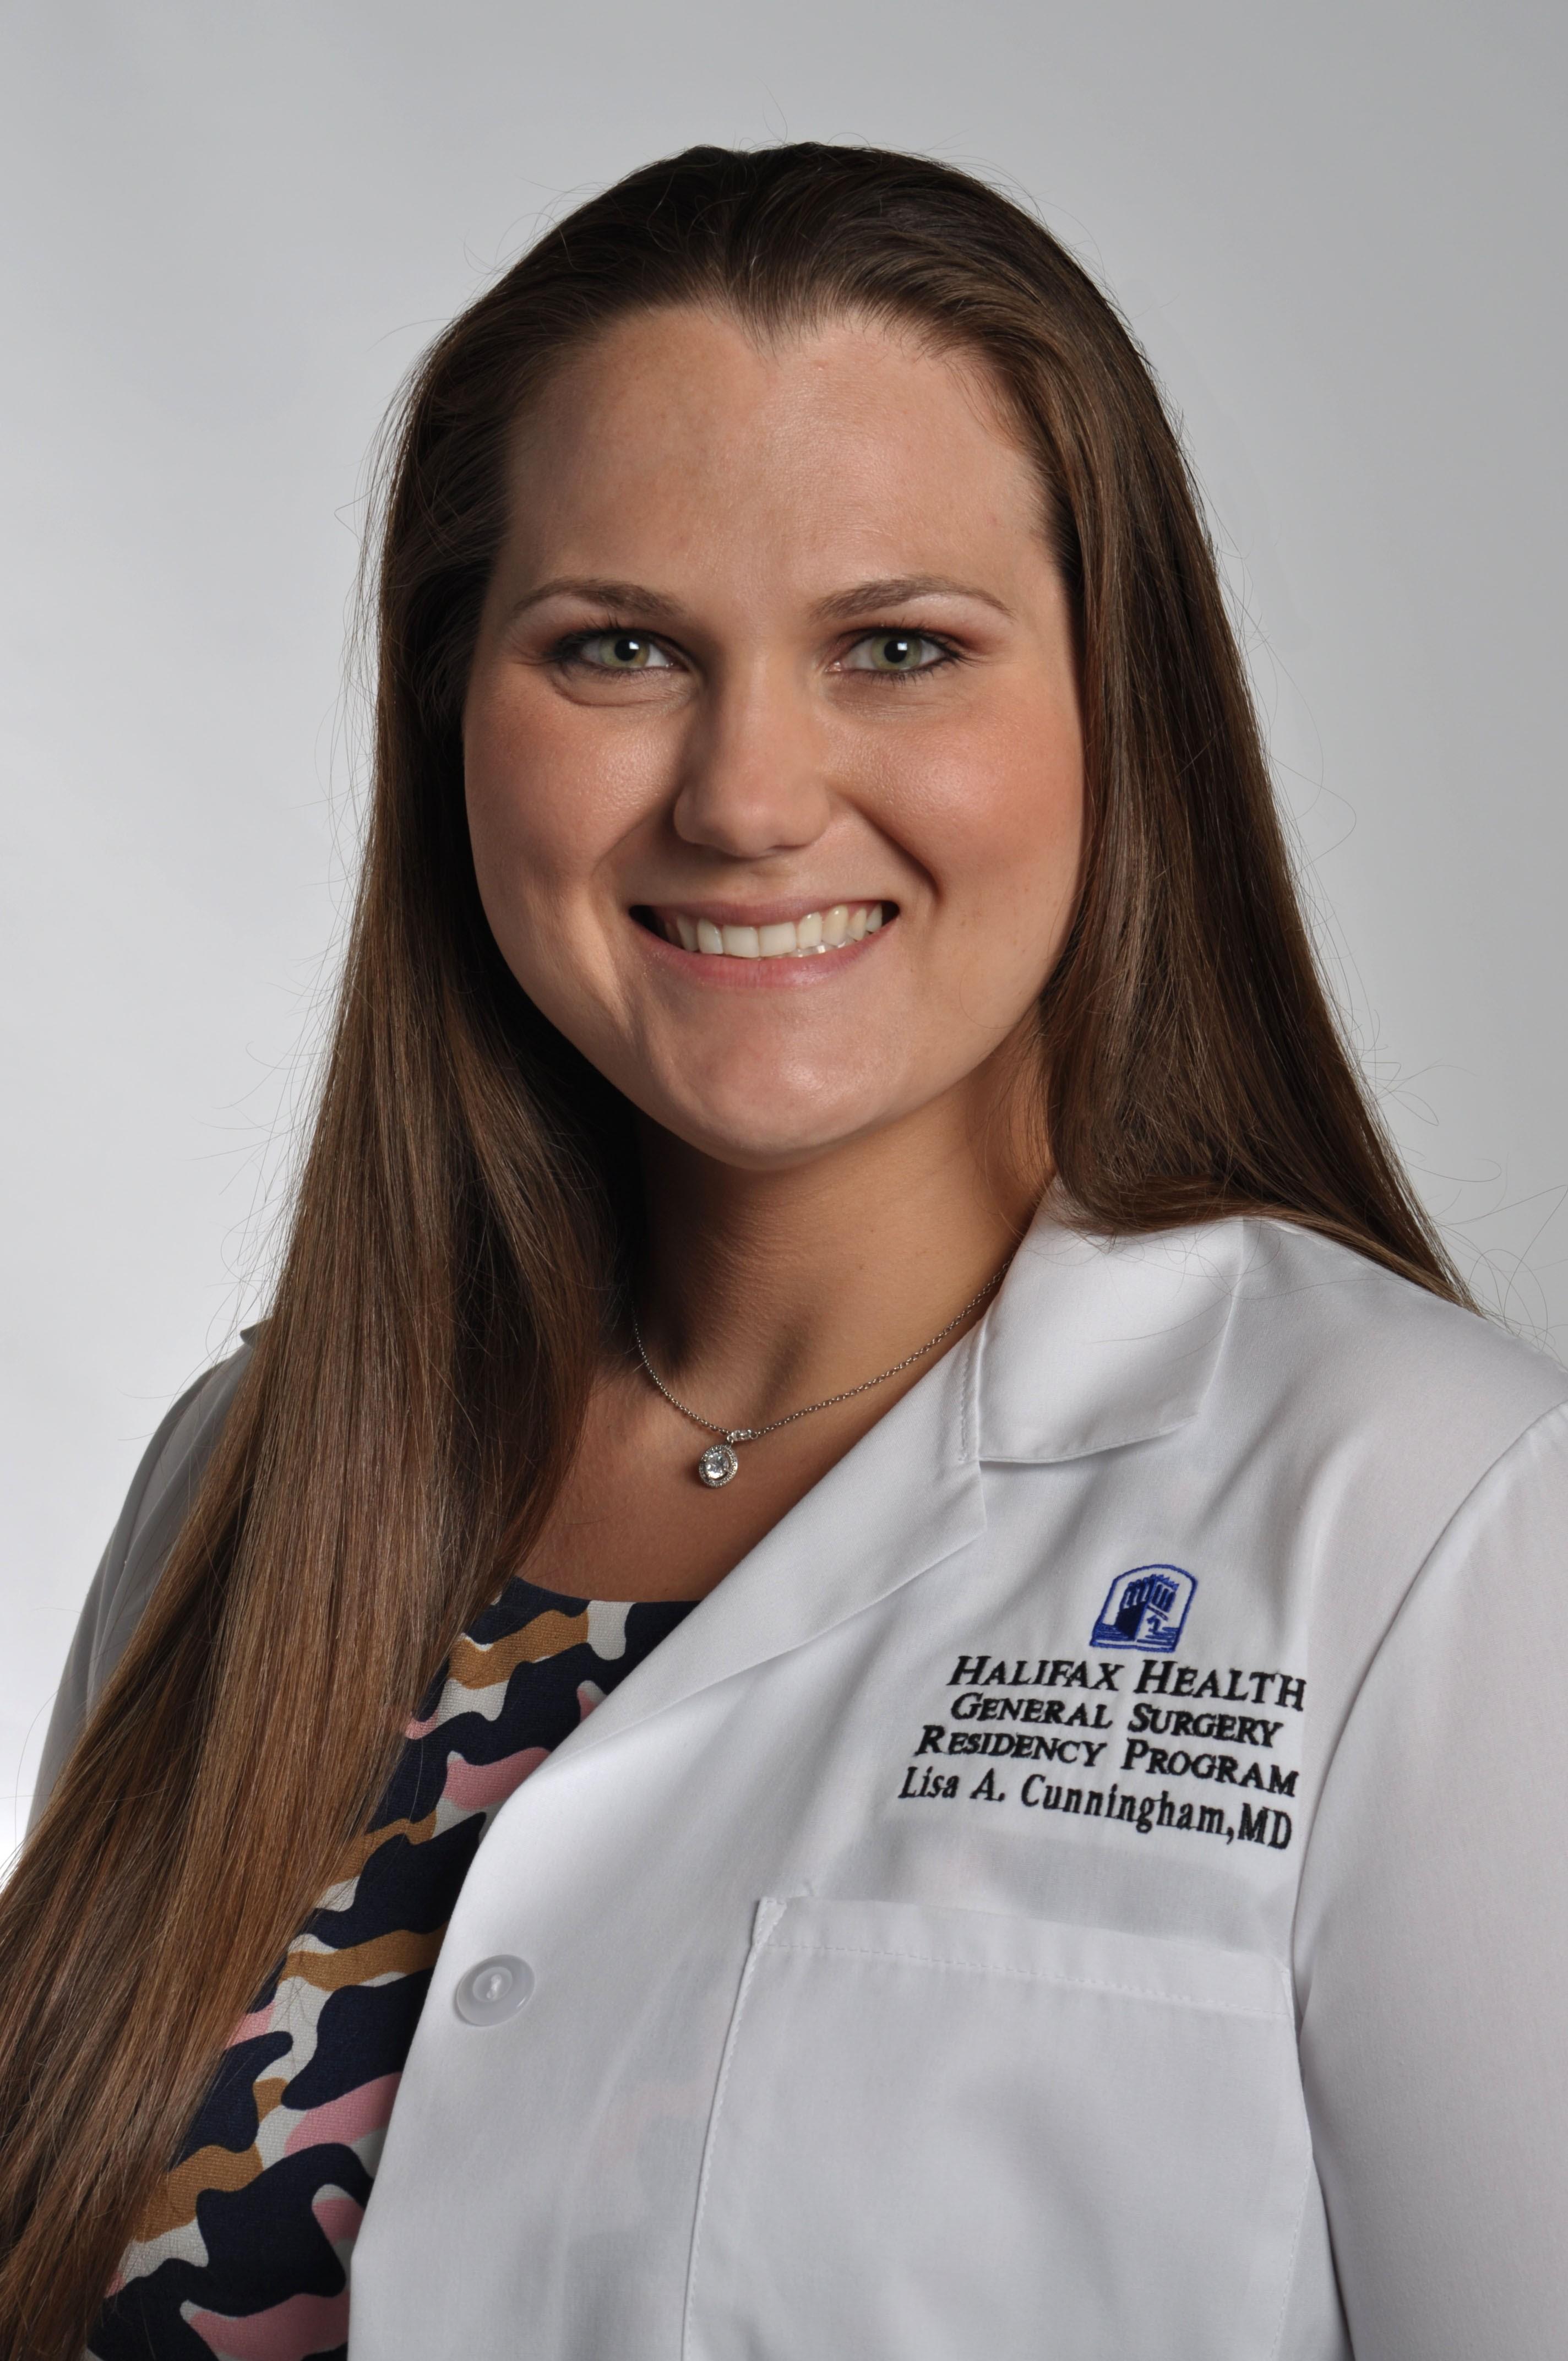 Lisa Cunningham, MD